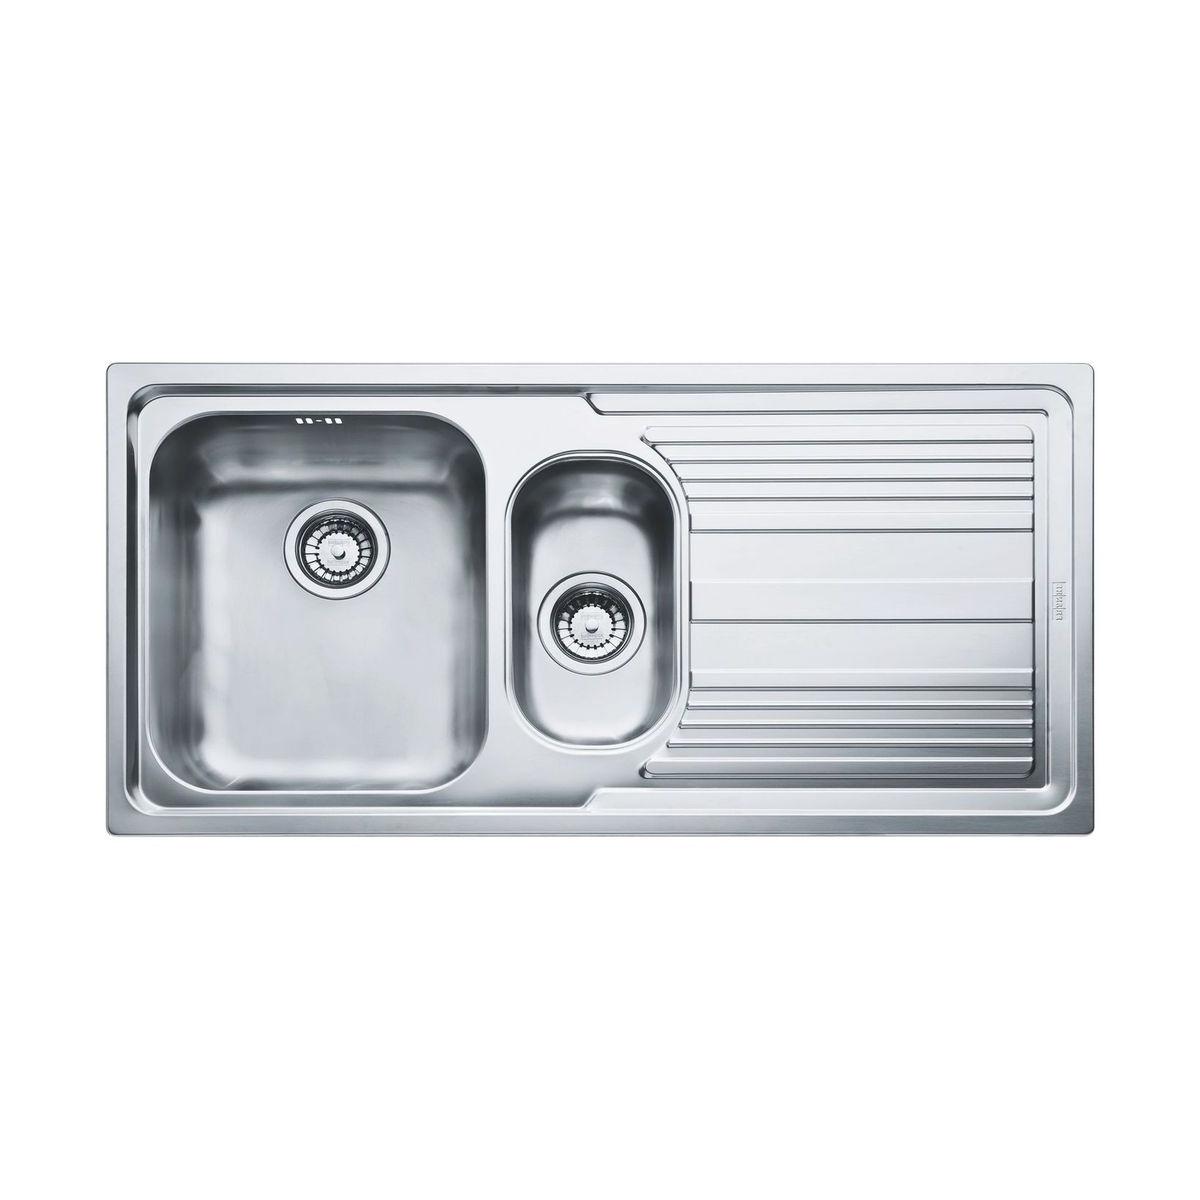 Кухонная мойка Franke Logica Line LLX 651 чаша слева полированная цена